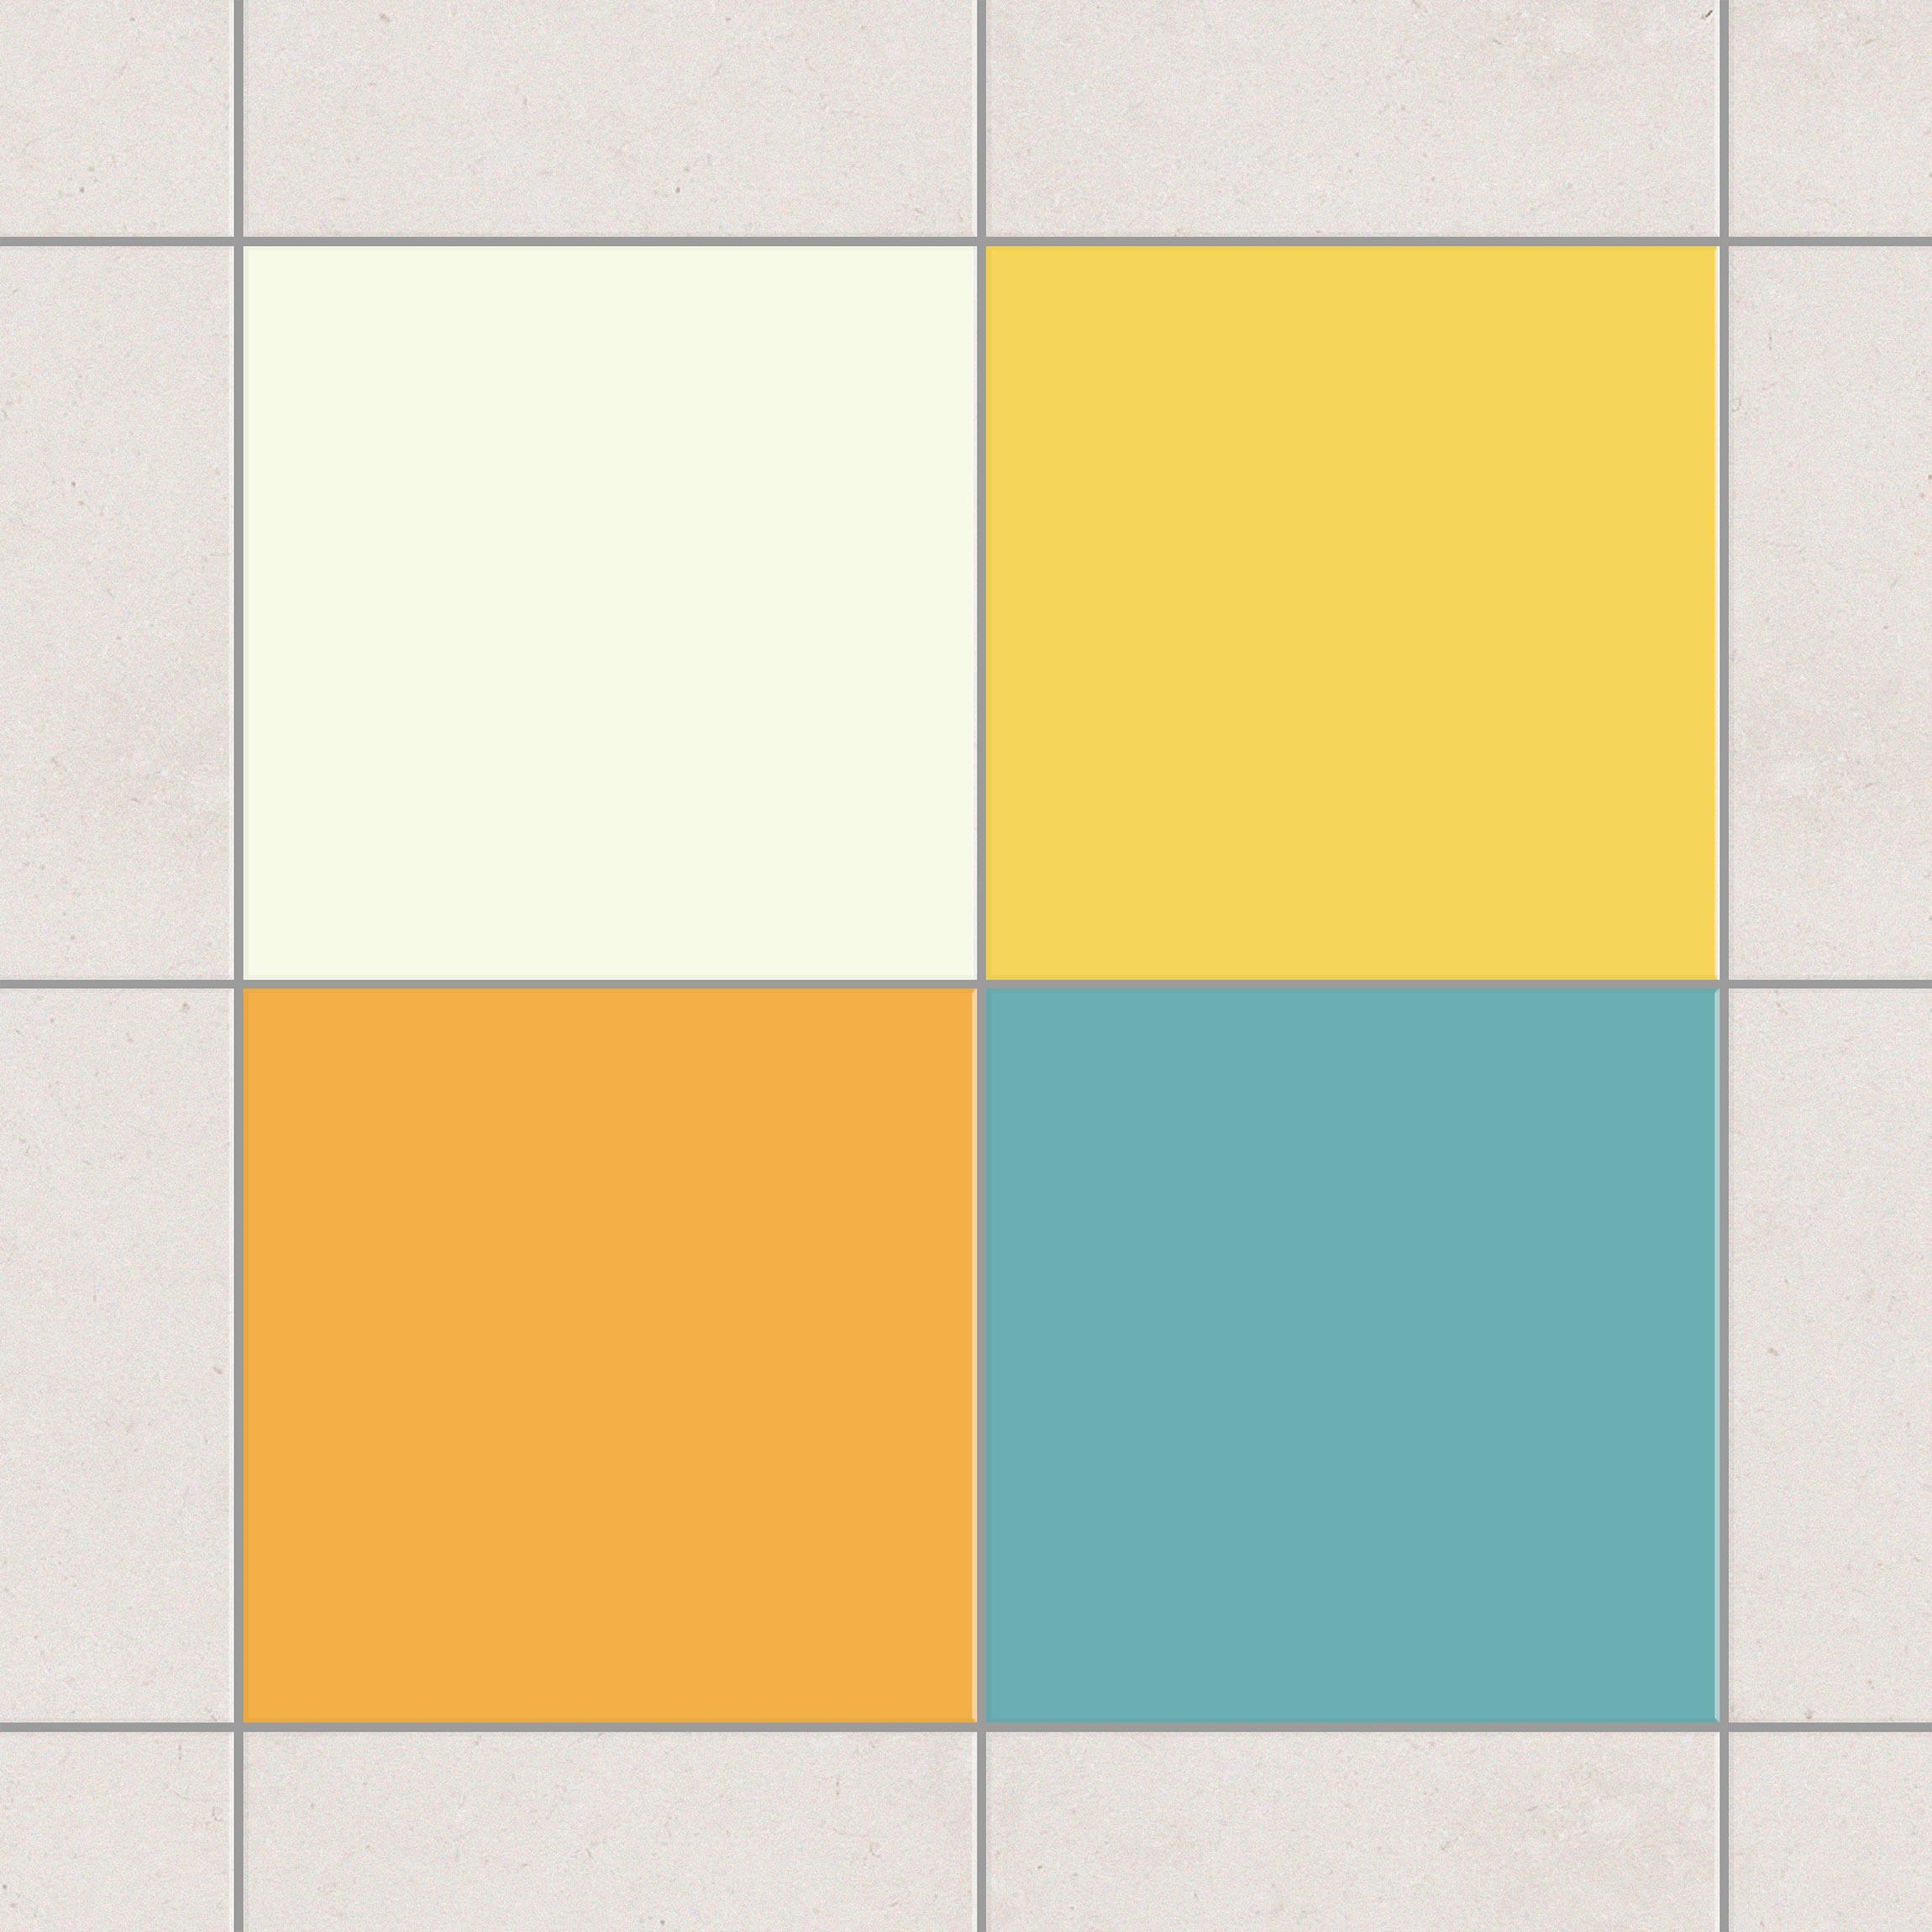 Fliesenaufkleber farbset sommer 15x15 cm for Fliesensticker 15x15